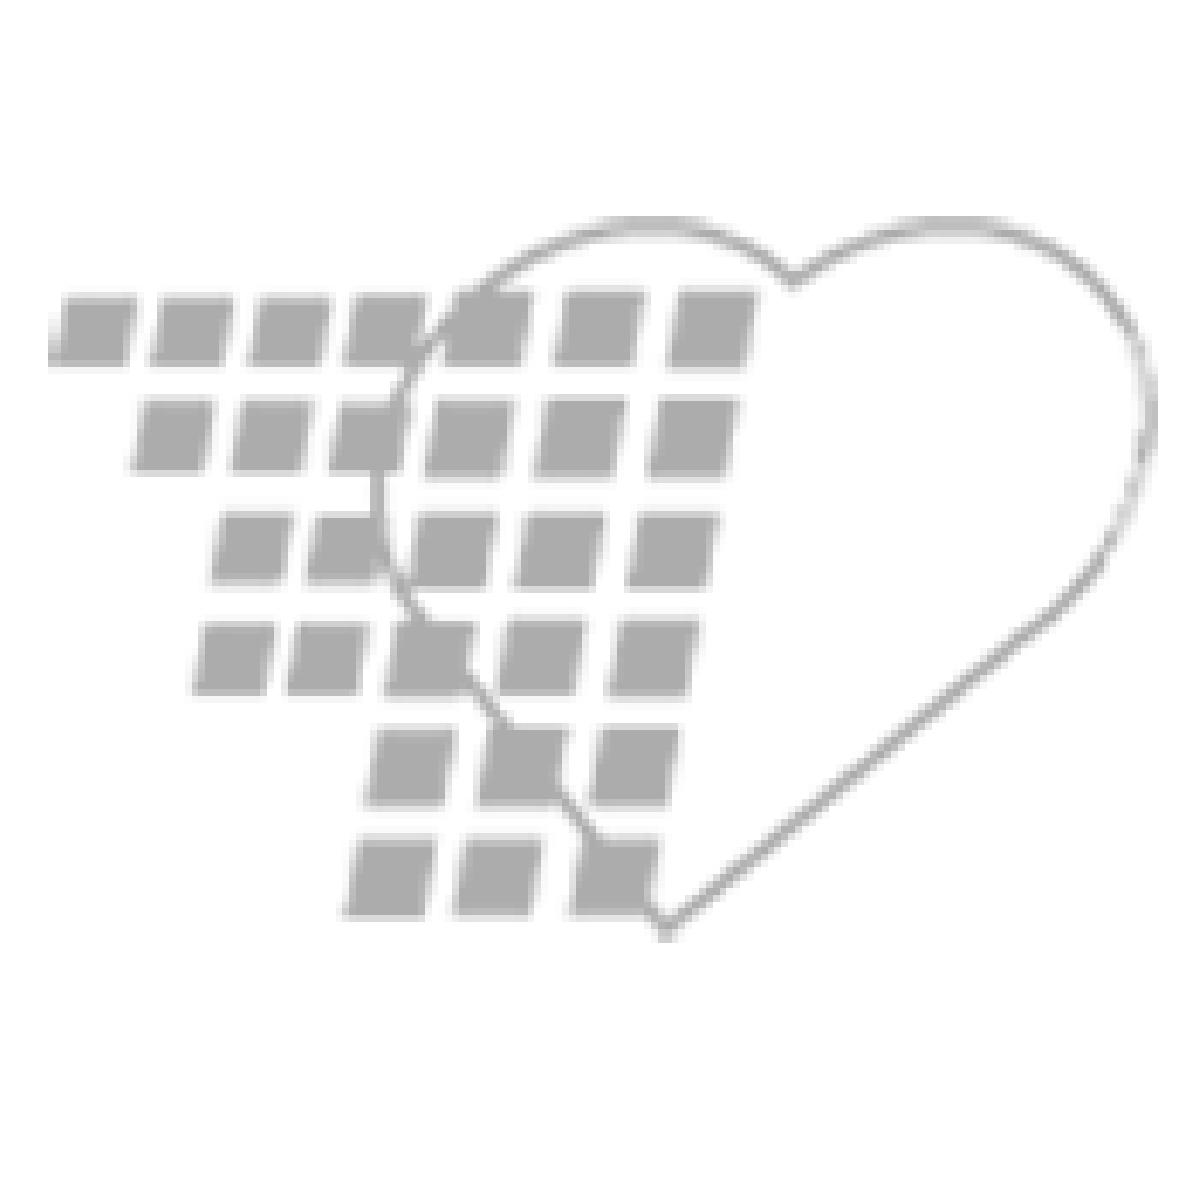 05-76-6545 Posey® E-Z Clean Economy Gait Belt Fits Waist Size Up To 58 Inch Black